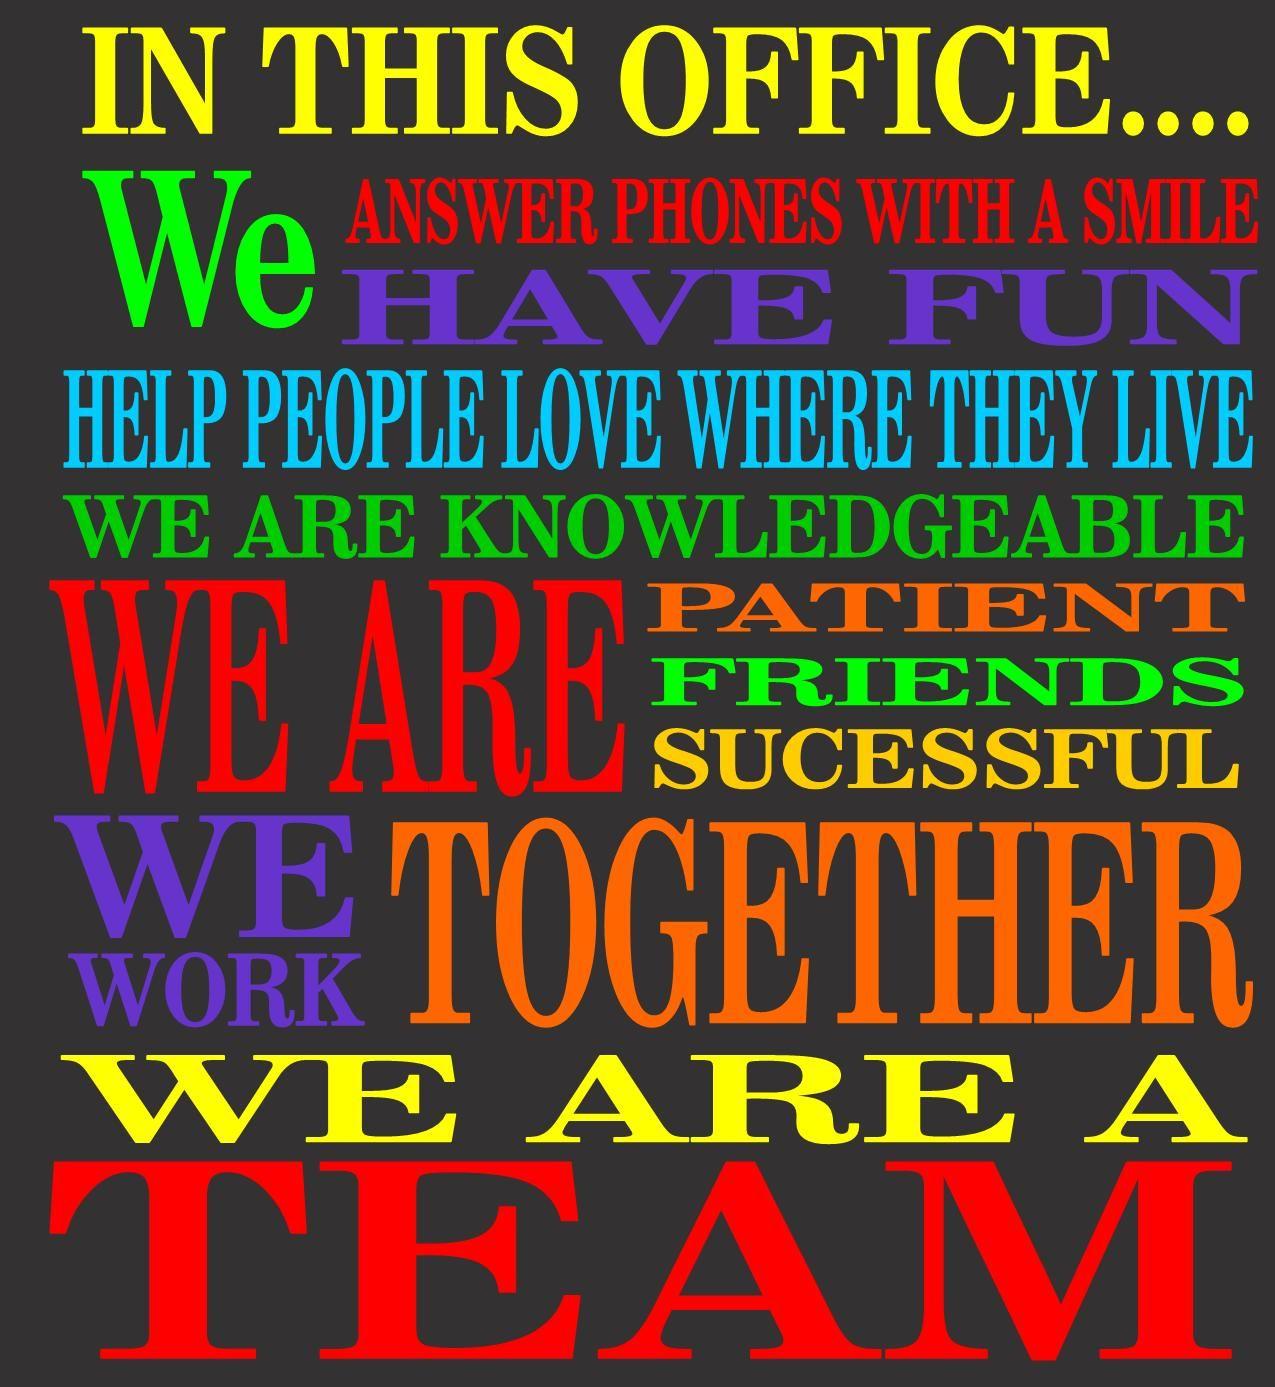 42 Inspirational Teamwork Quotes